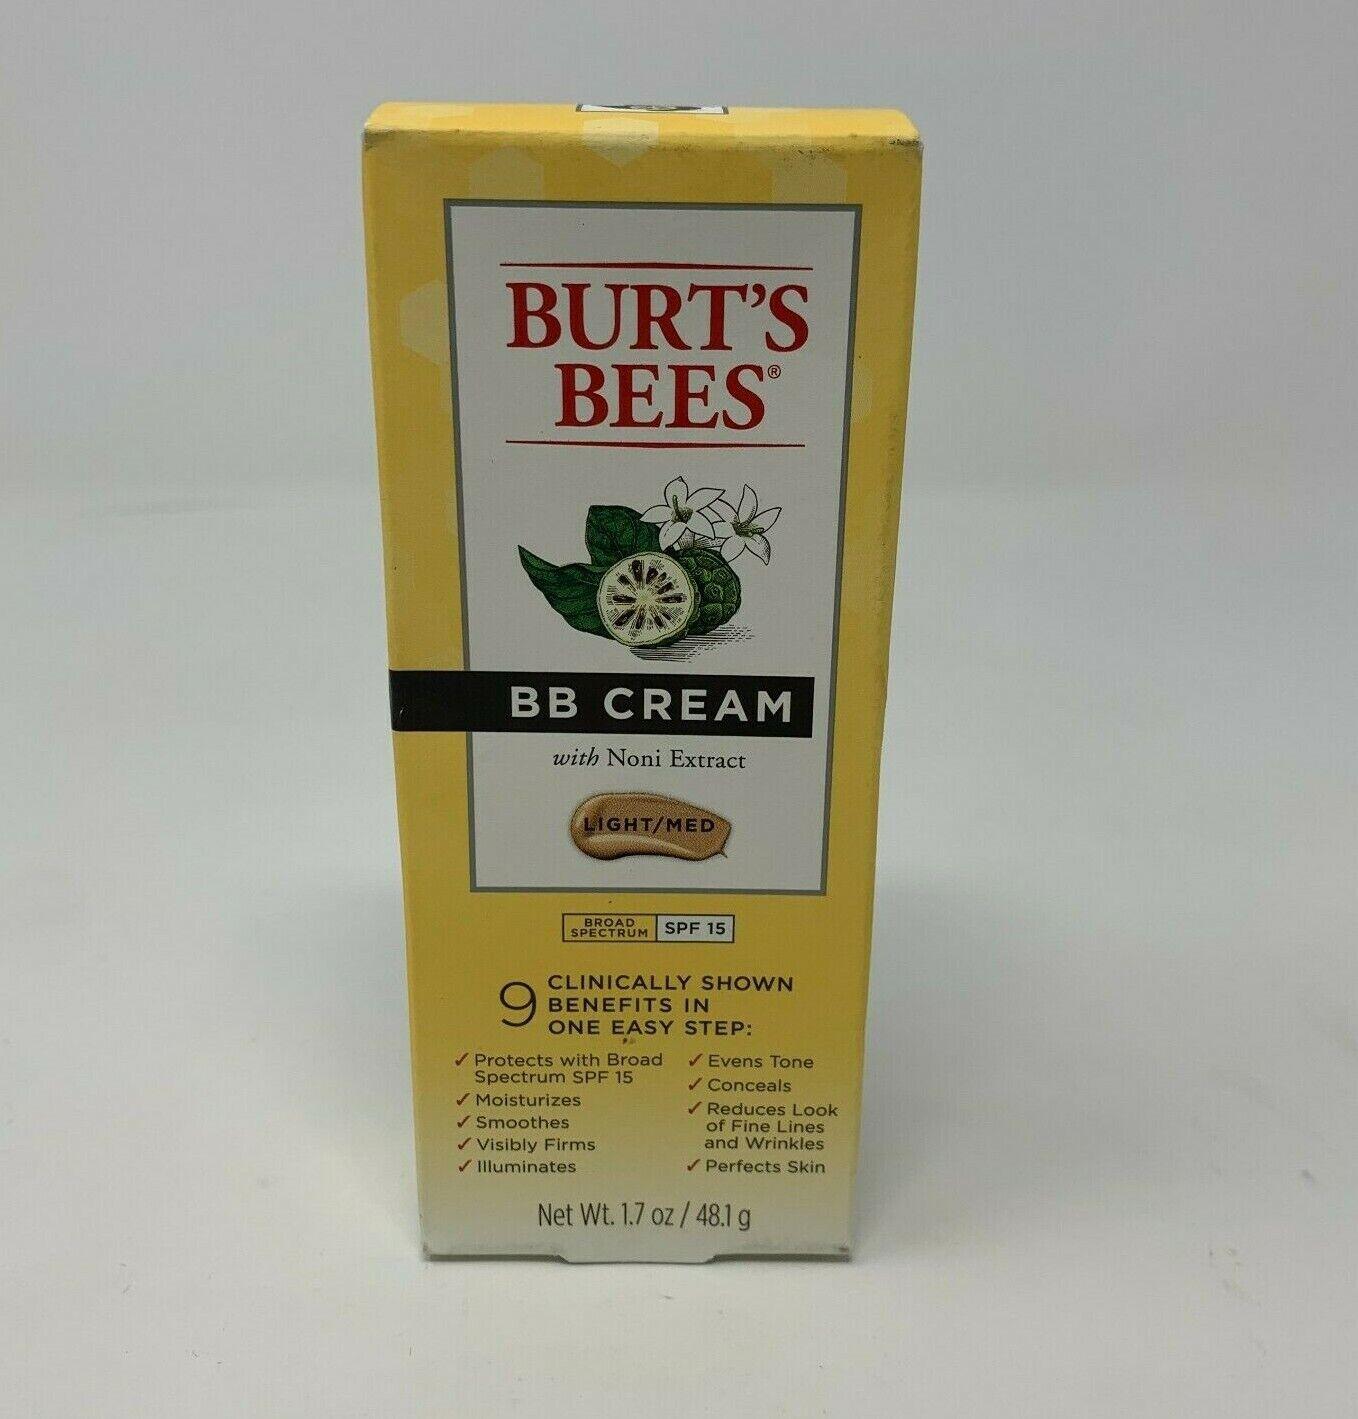 BB Cream Light/Medium SPF 15 Burt's Bees 1.7 oz Cream